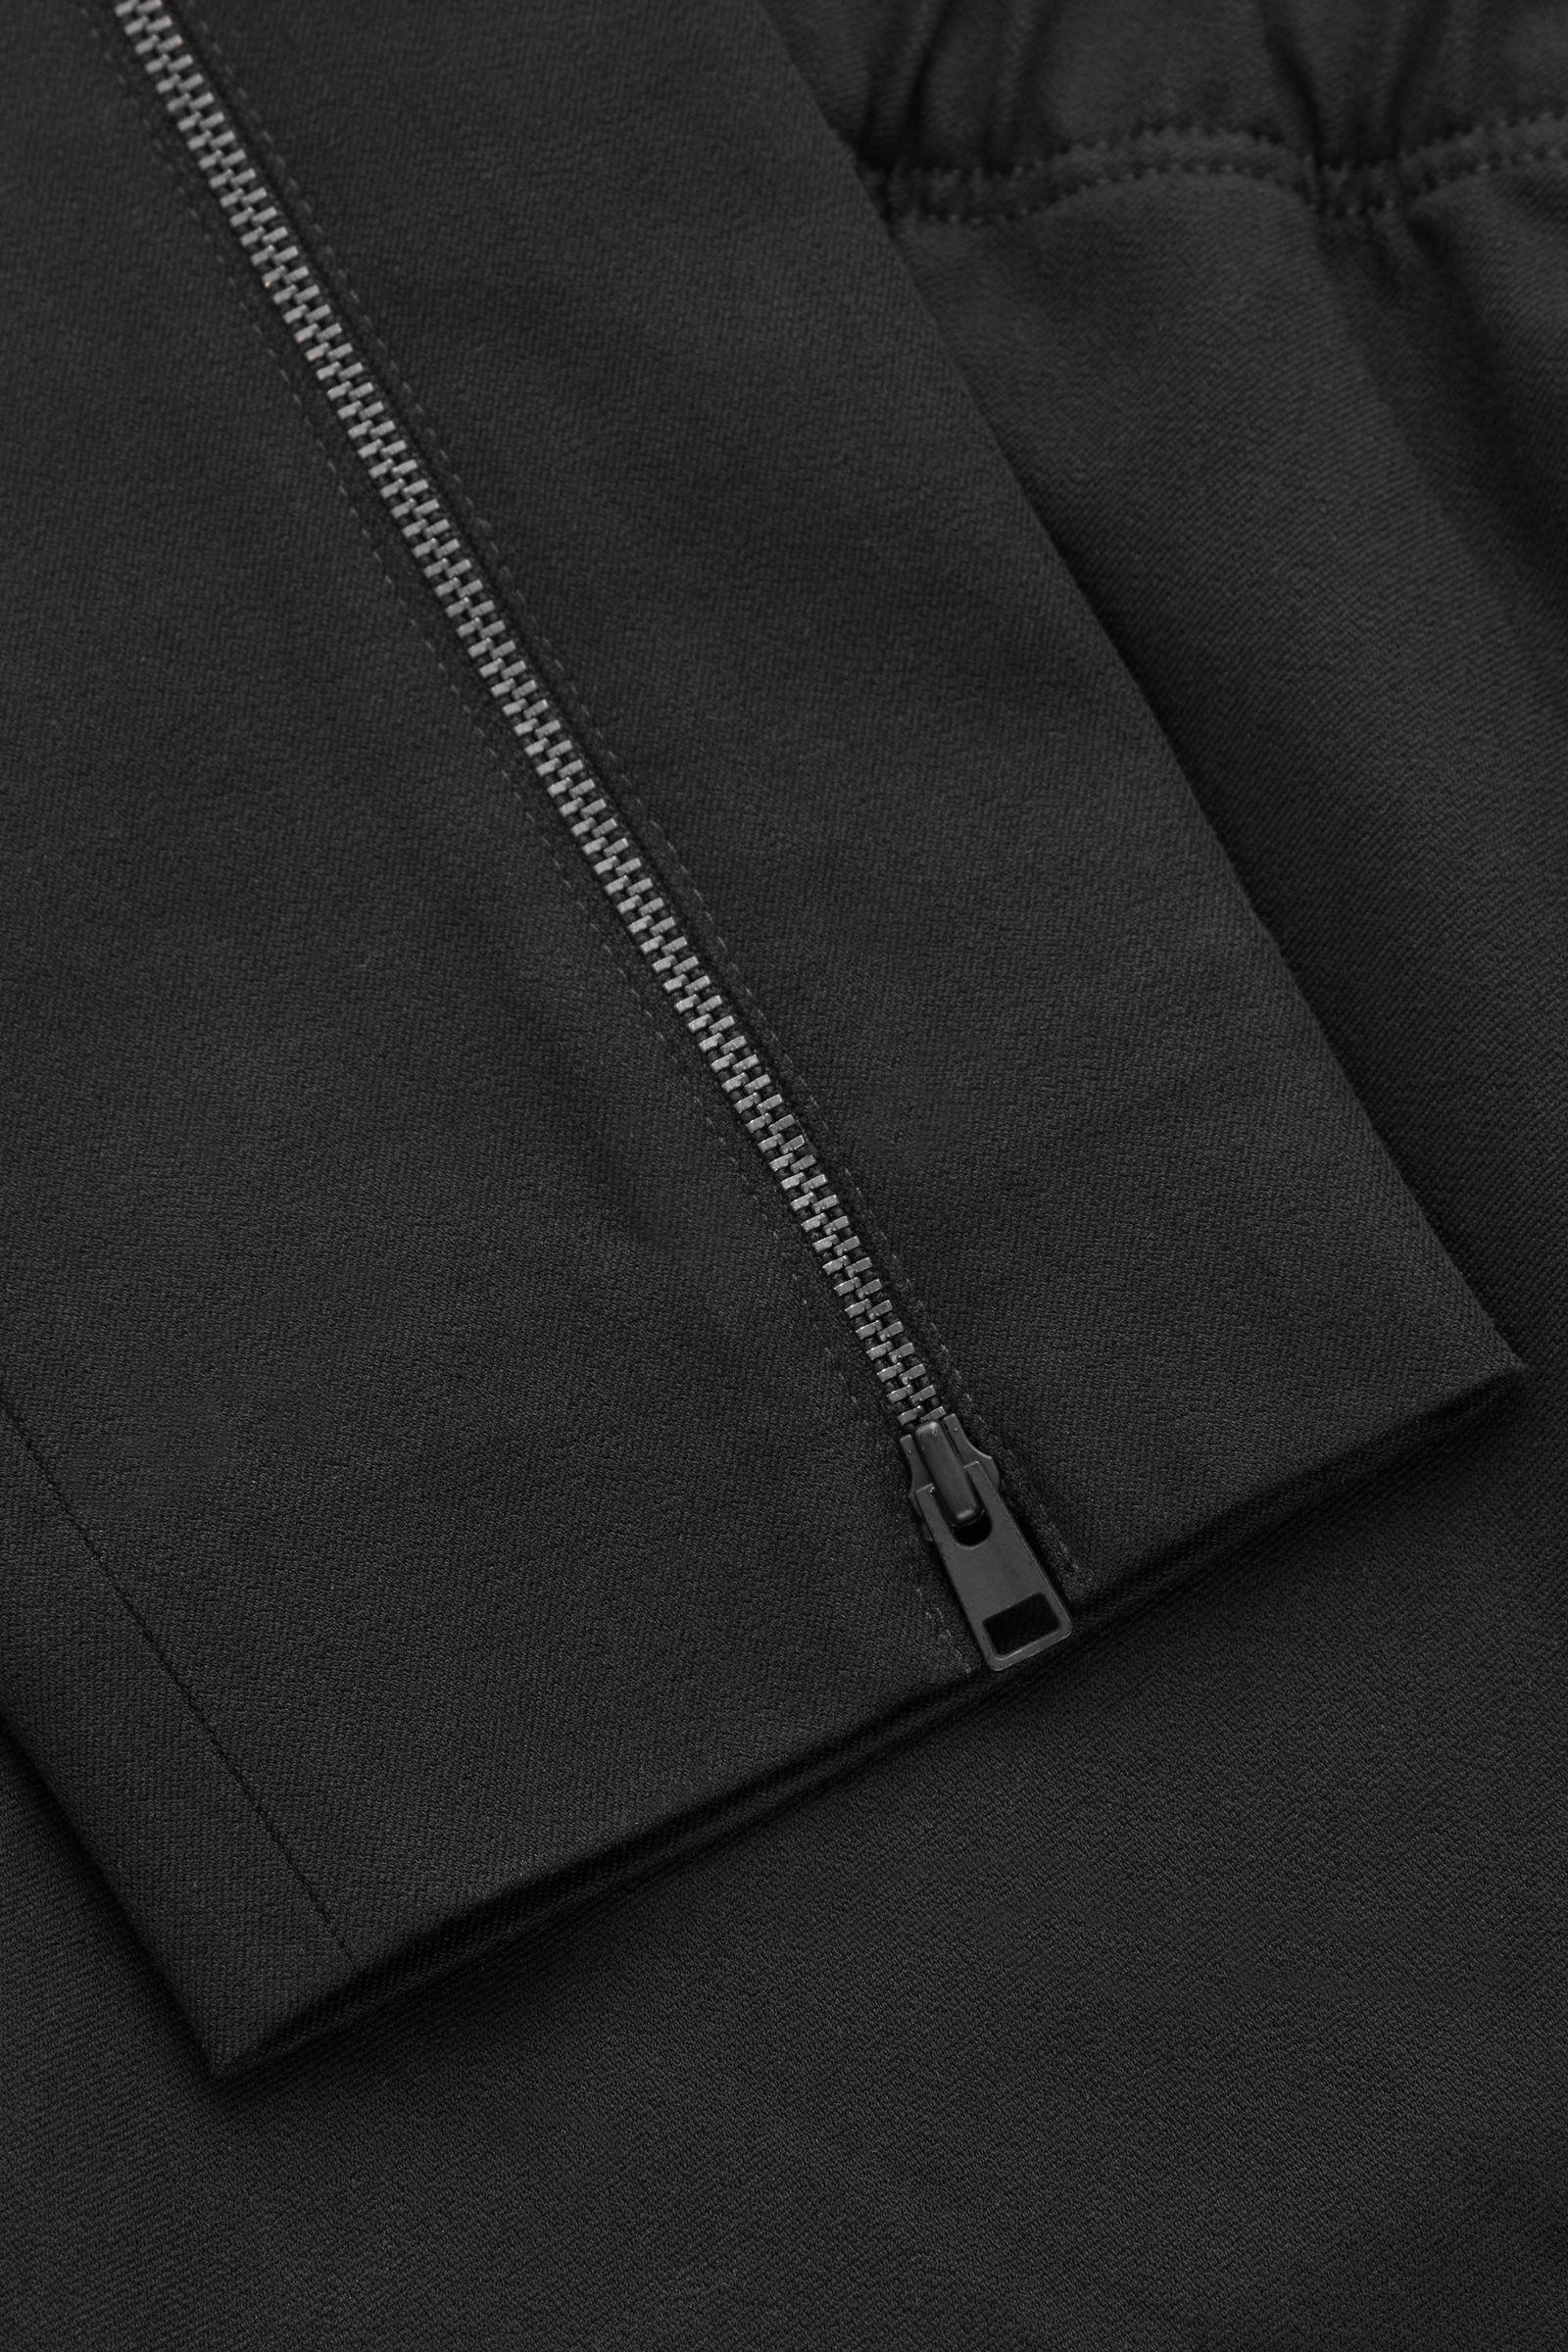 COS 스키니 레깅스 트라우저의 블랙컬러 Detail입니다.